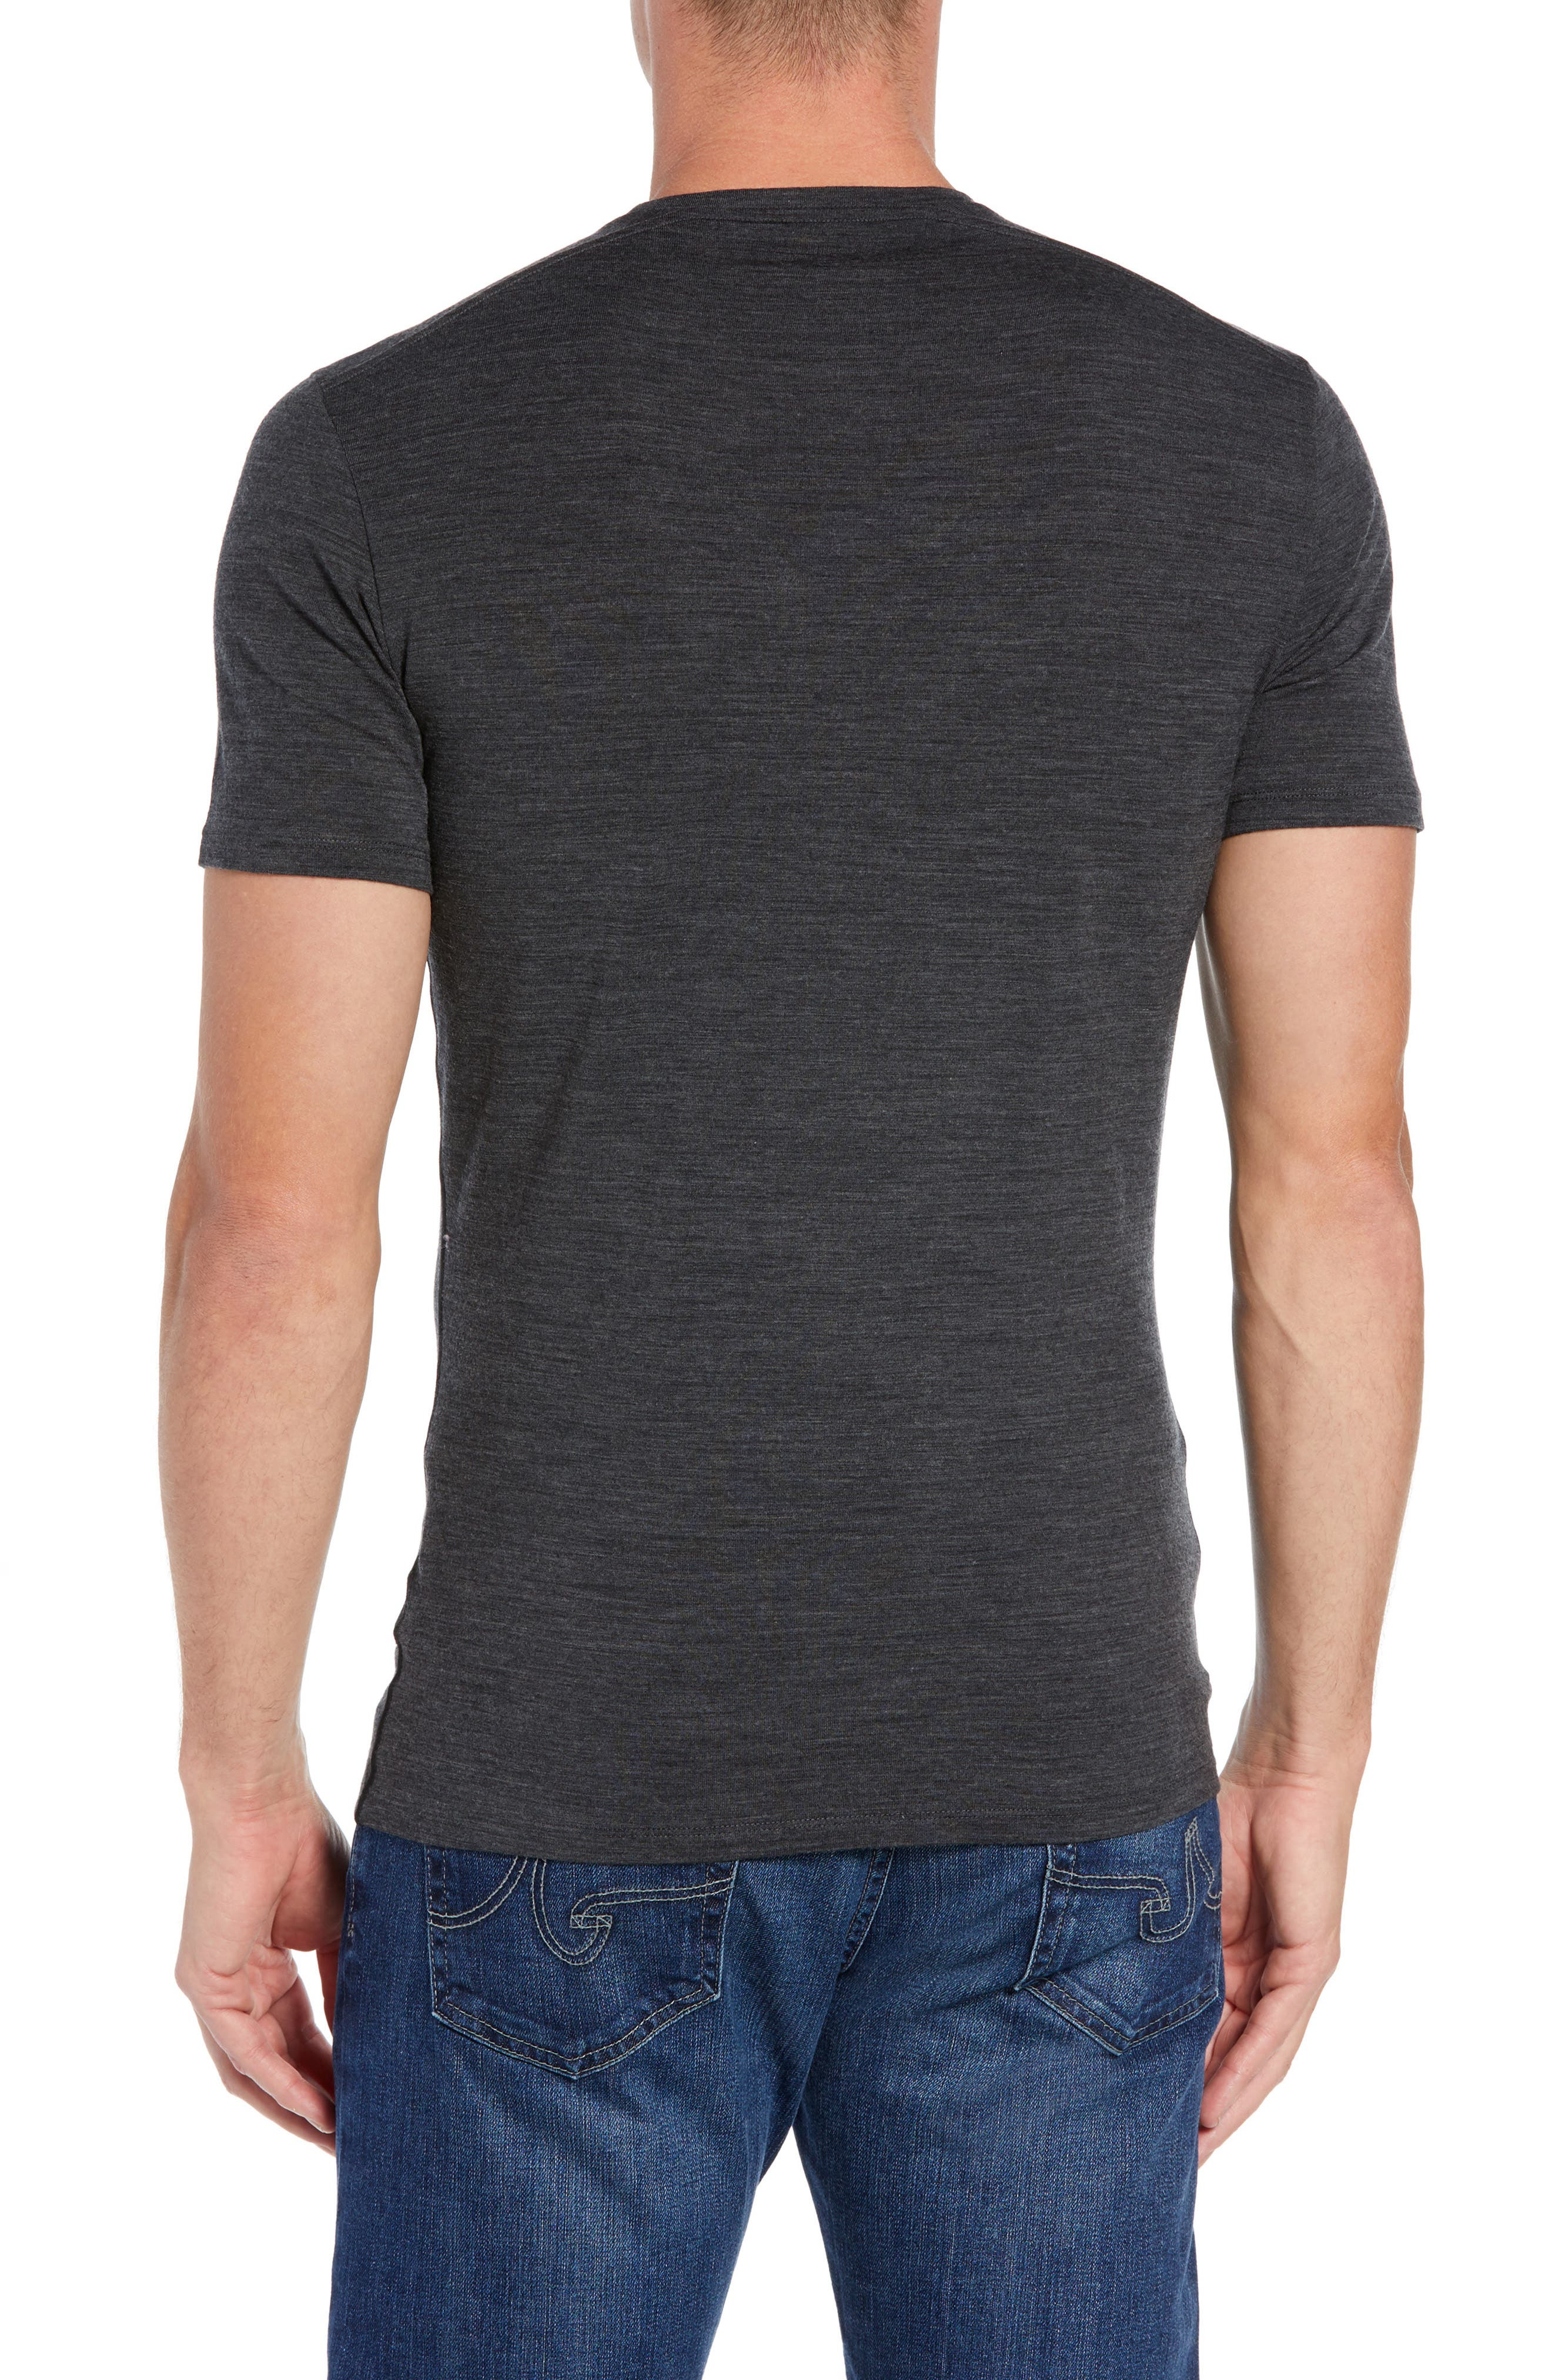 Anatomica Short Sleeve Crewneck T-Shirt,                             Alternate thumbnail 2, color,                             JET HEATHER/ BLACK